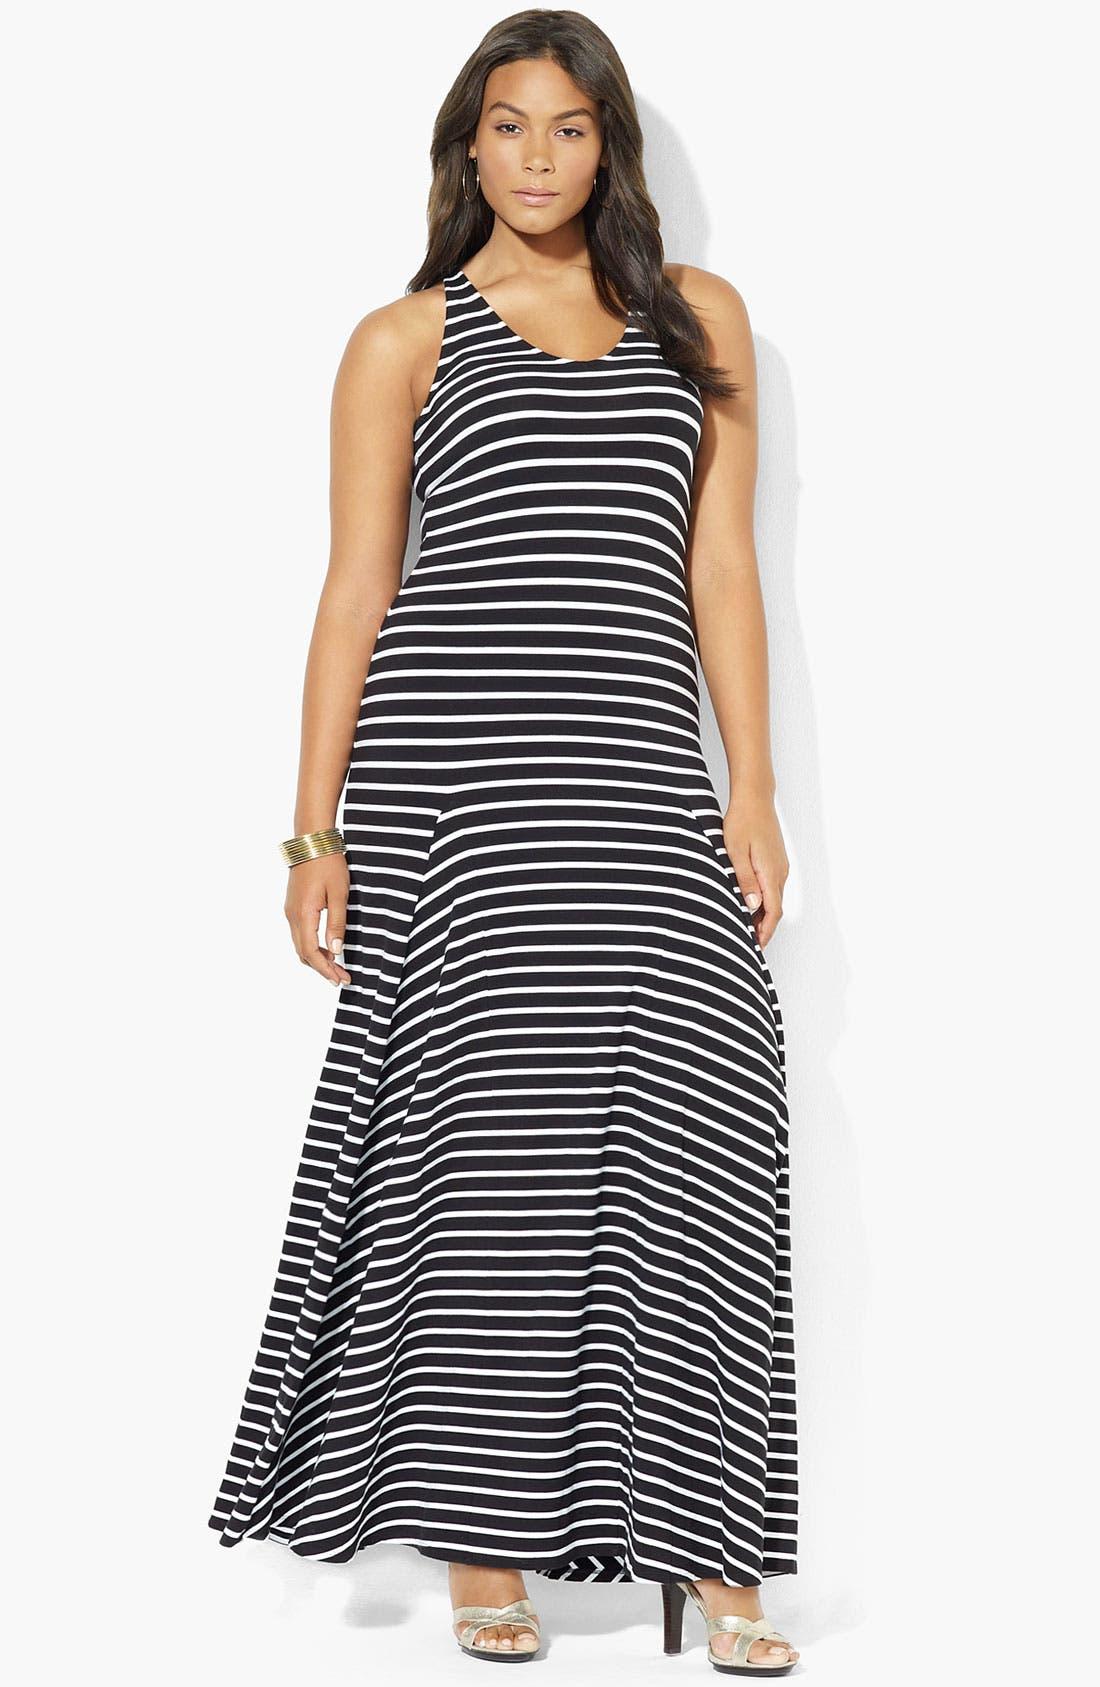 Alternate Image 1 Selected - Lauren Ralph Lauren V-Neck Maxi Dress (Plus)